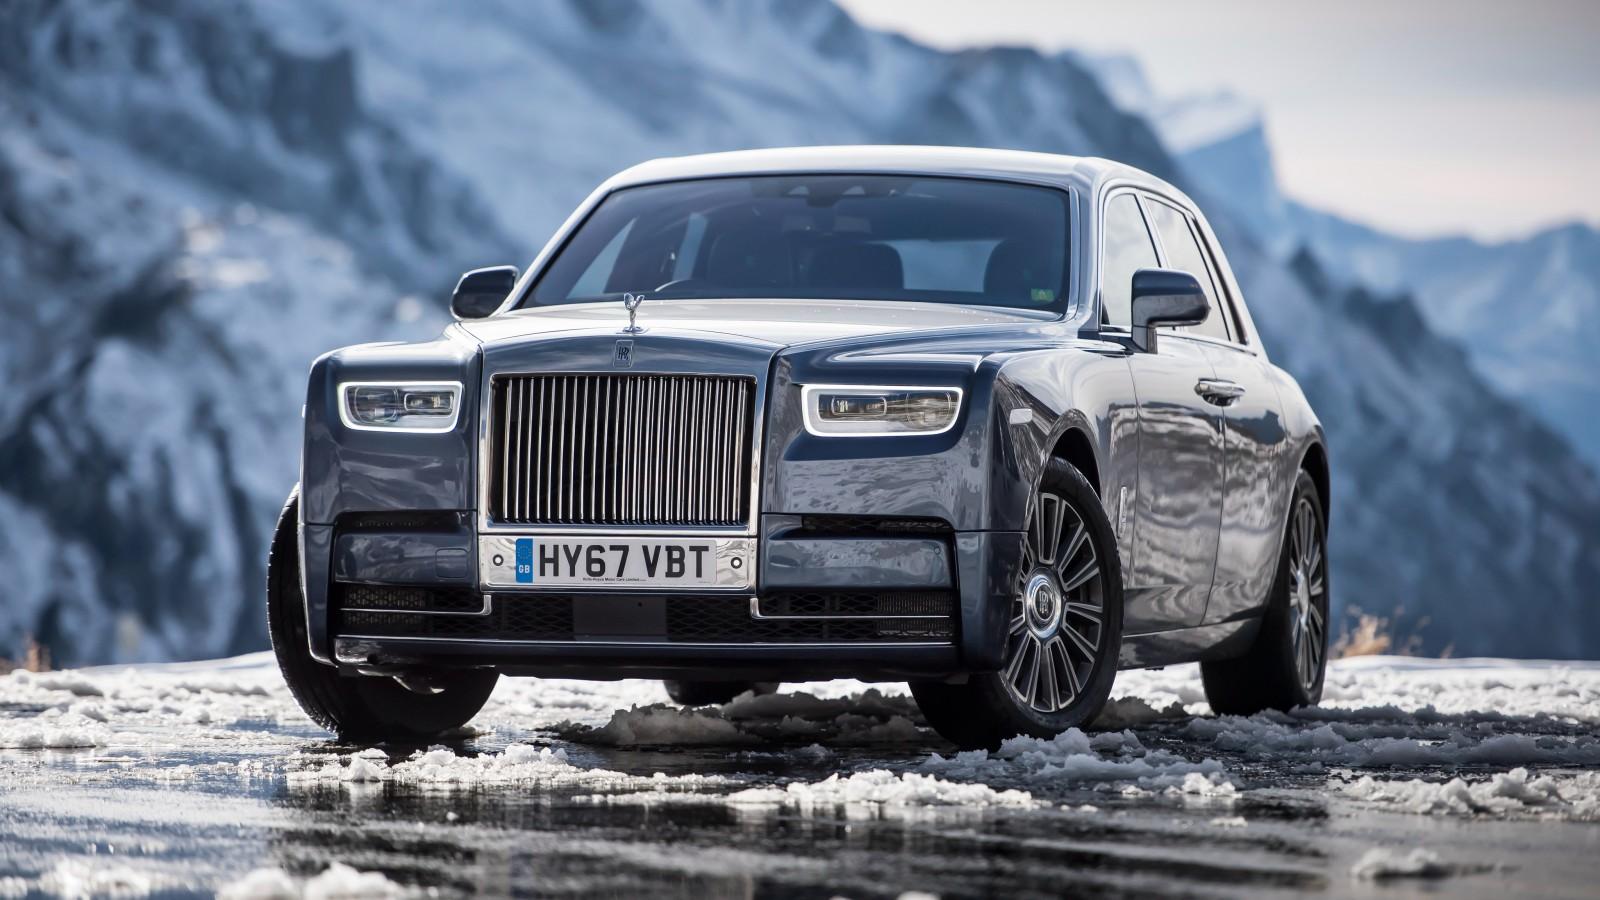 2017 Rolls Royce Phantom 4k 7 Wallpaper Hd Car